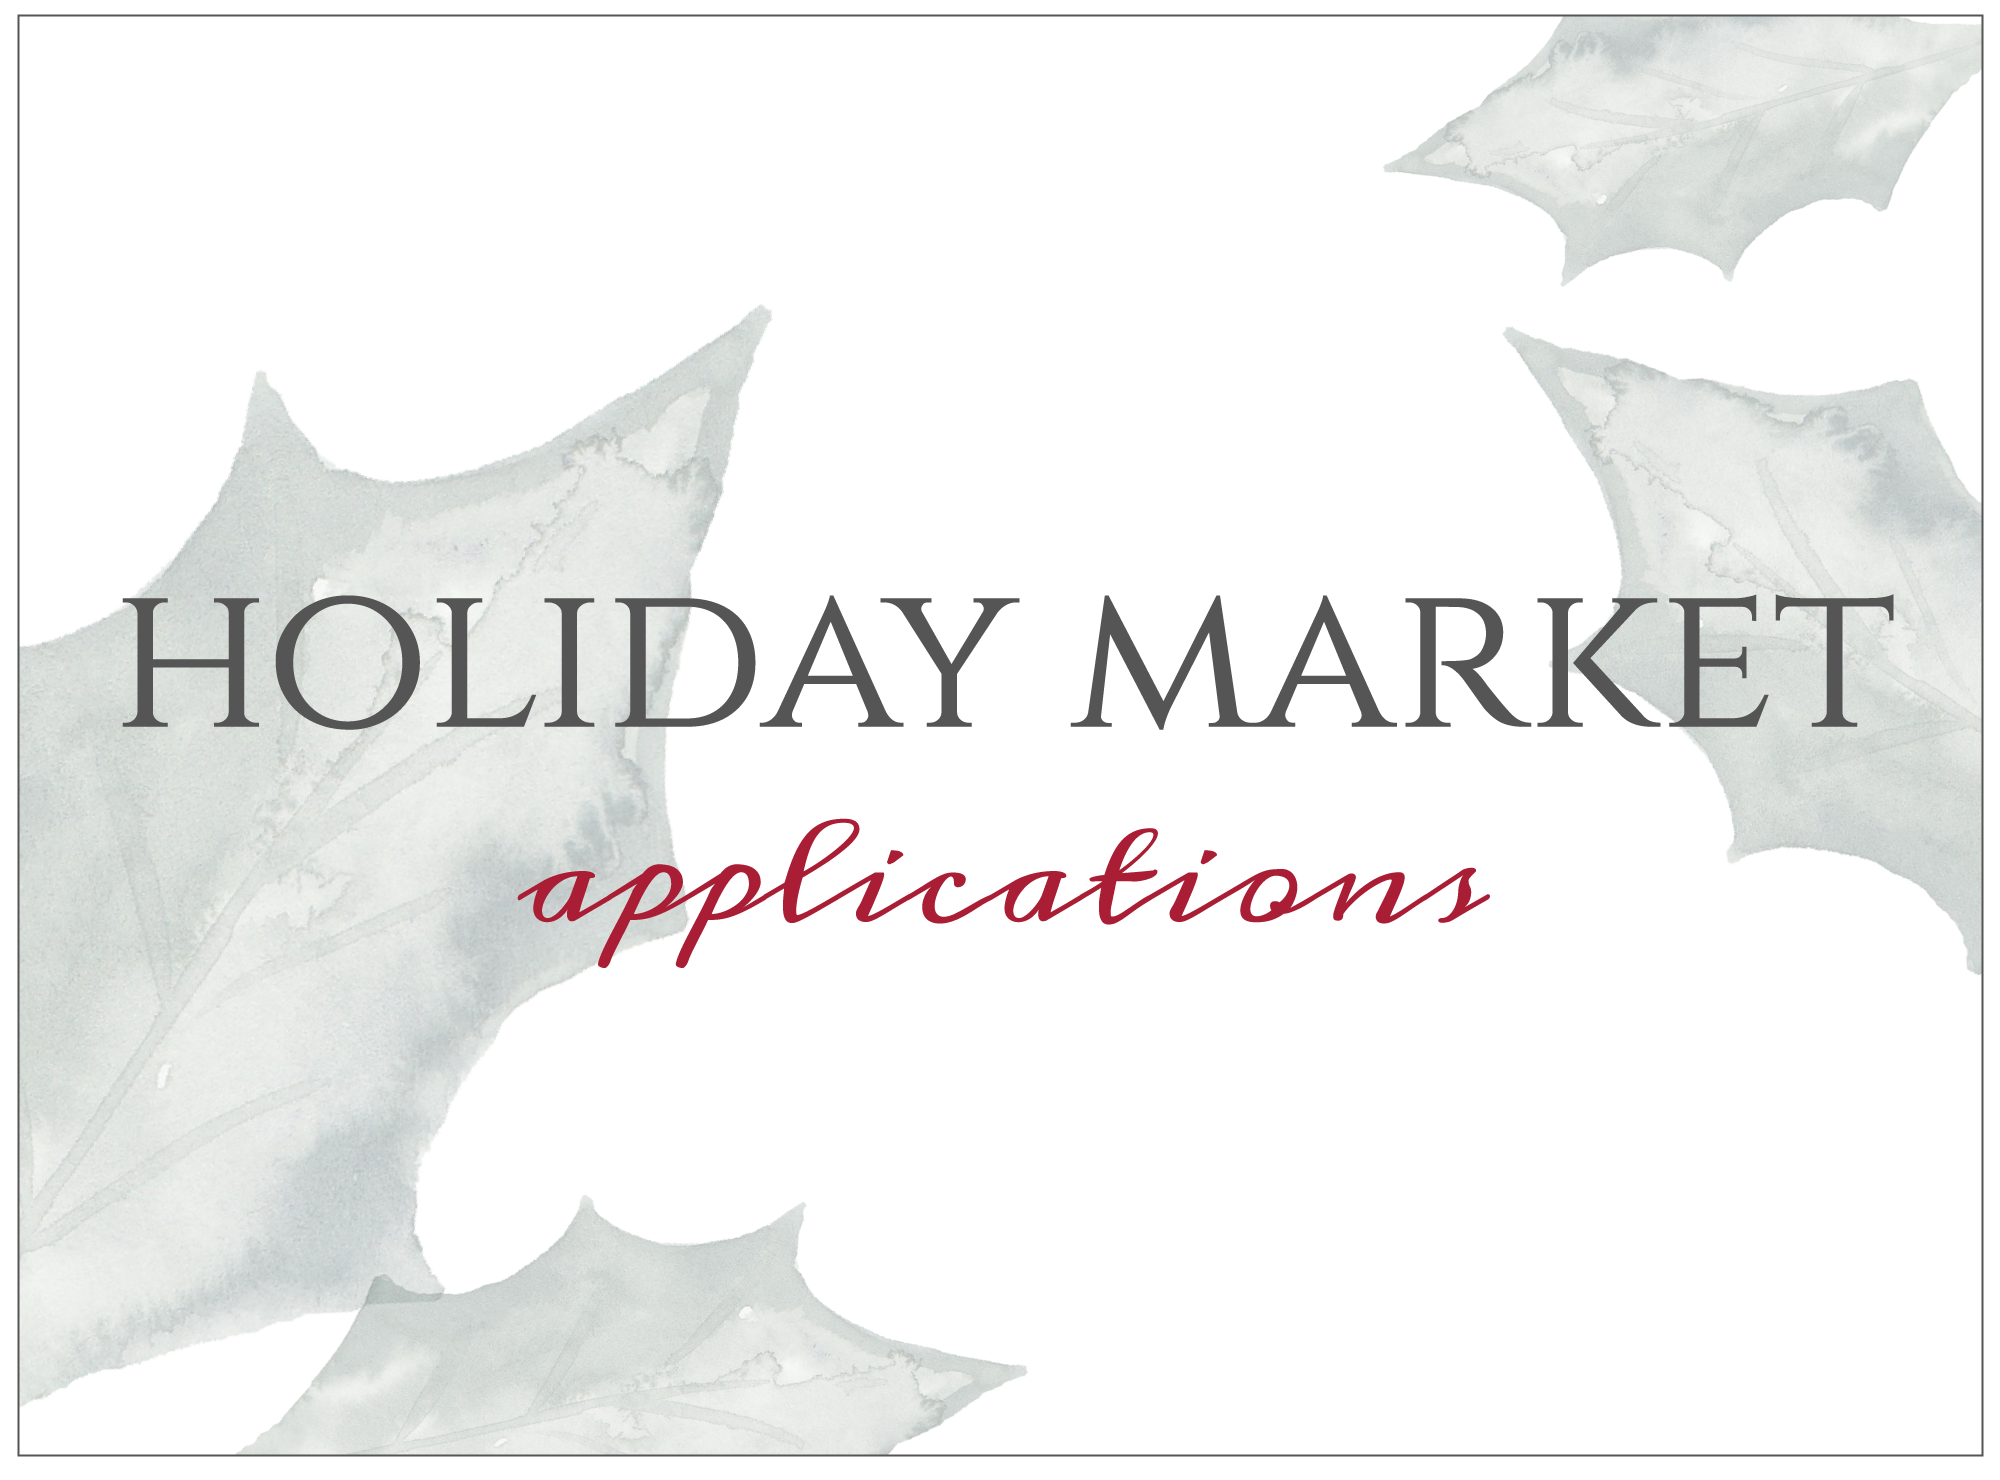 Holiday-Market-Applications.png